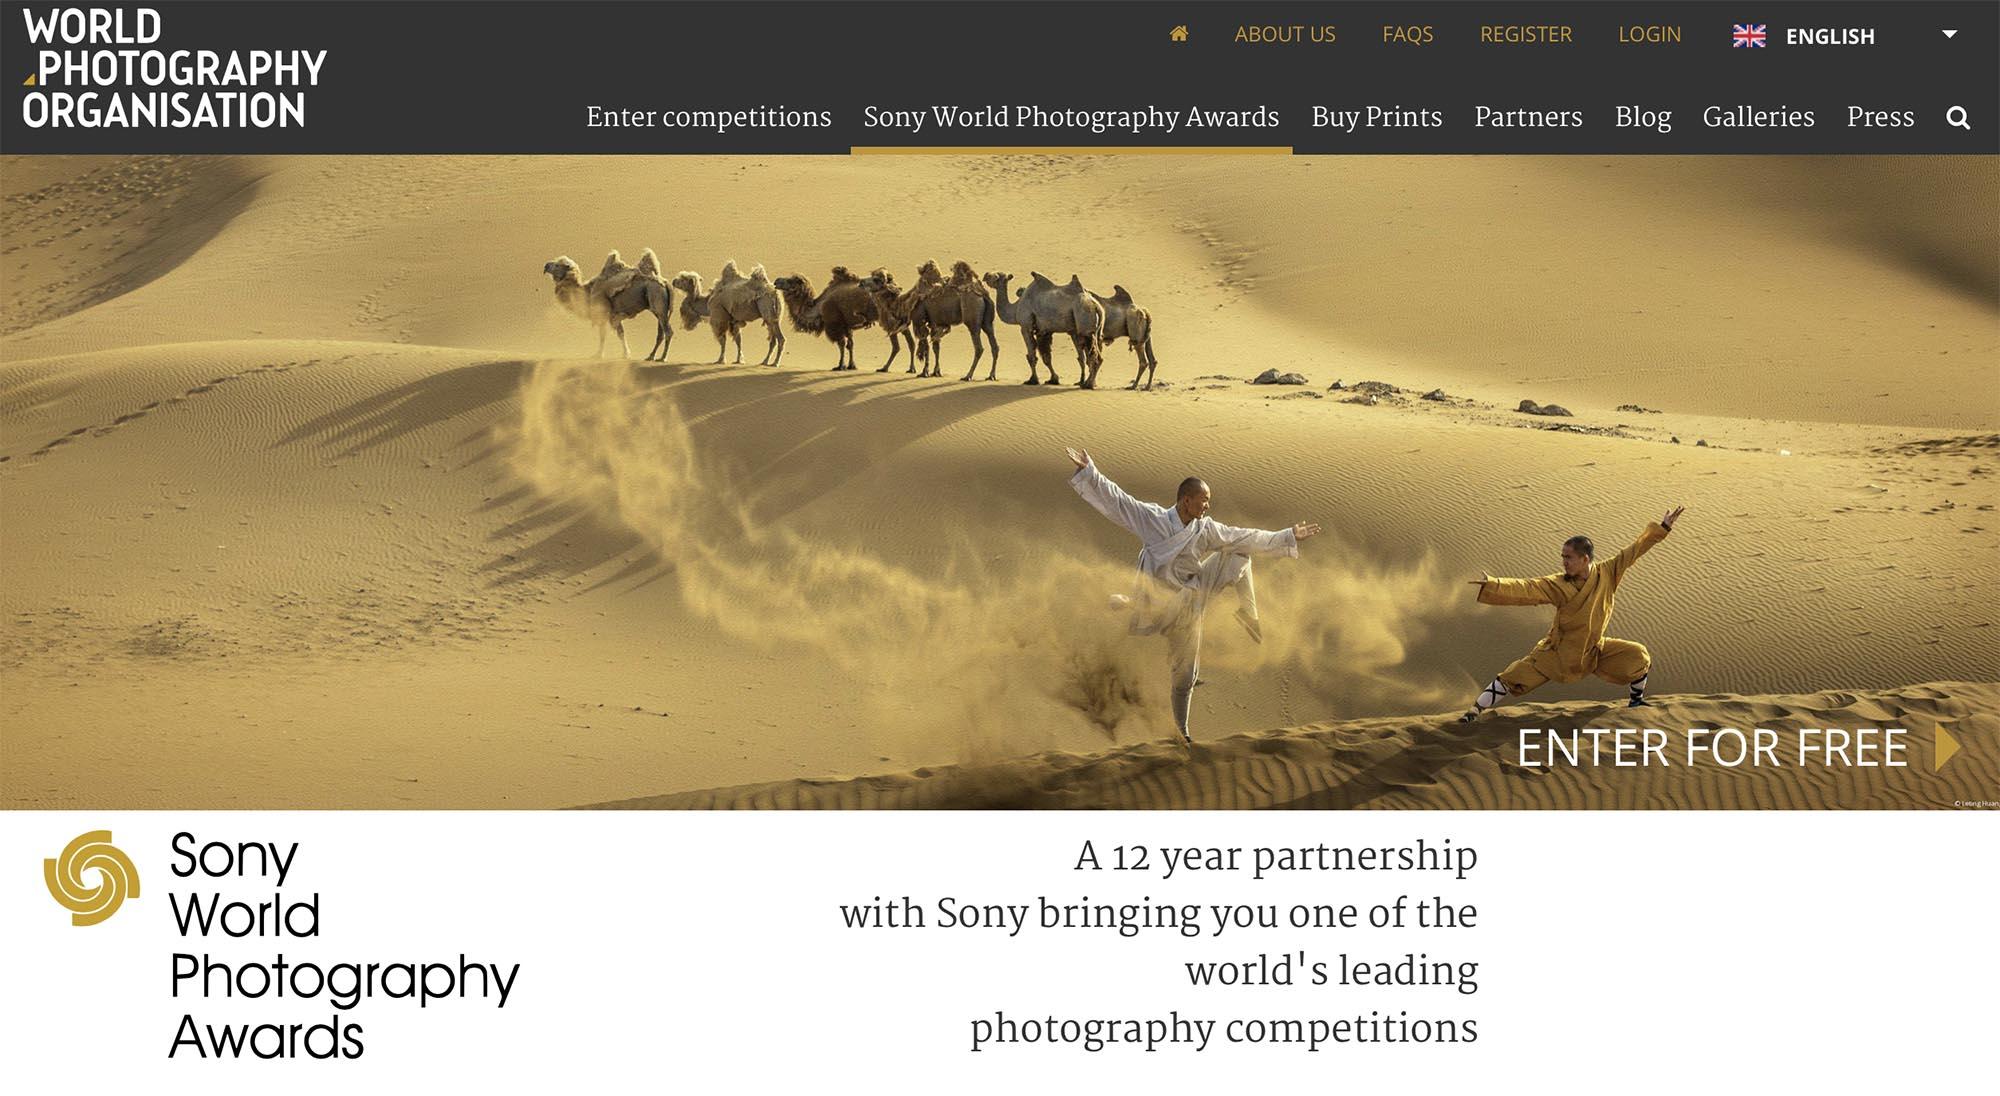 Sony 世界攝影大獎 2019 開始接受報名  新增紀實、主題及創意攝影組別